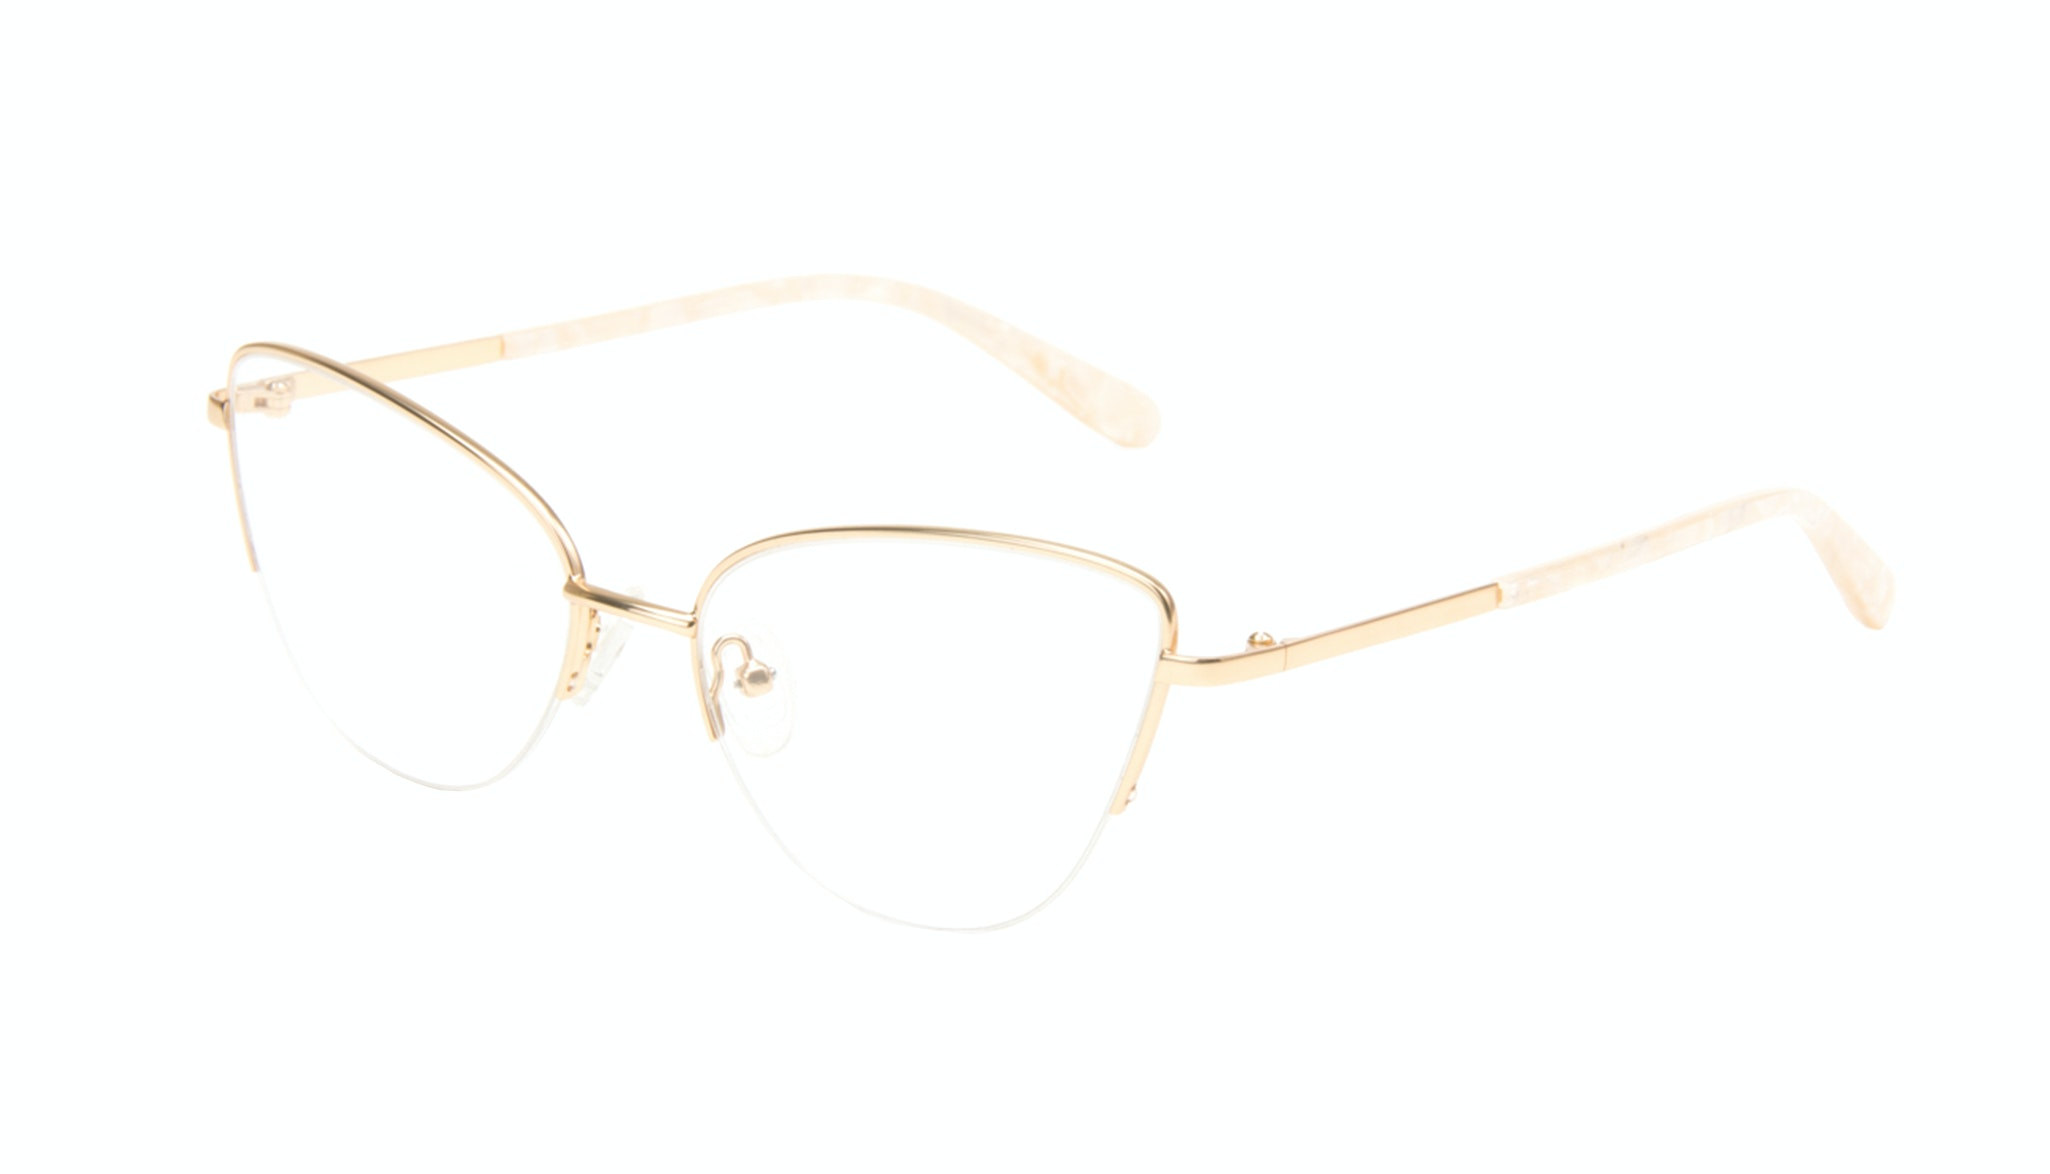 Affordable Fashion Glasses Cat Eye Eyeglasses Women Airy  Gold Marble Tilt